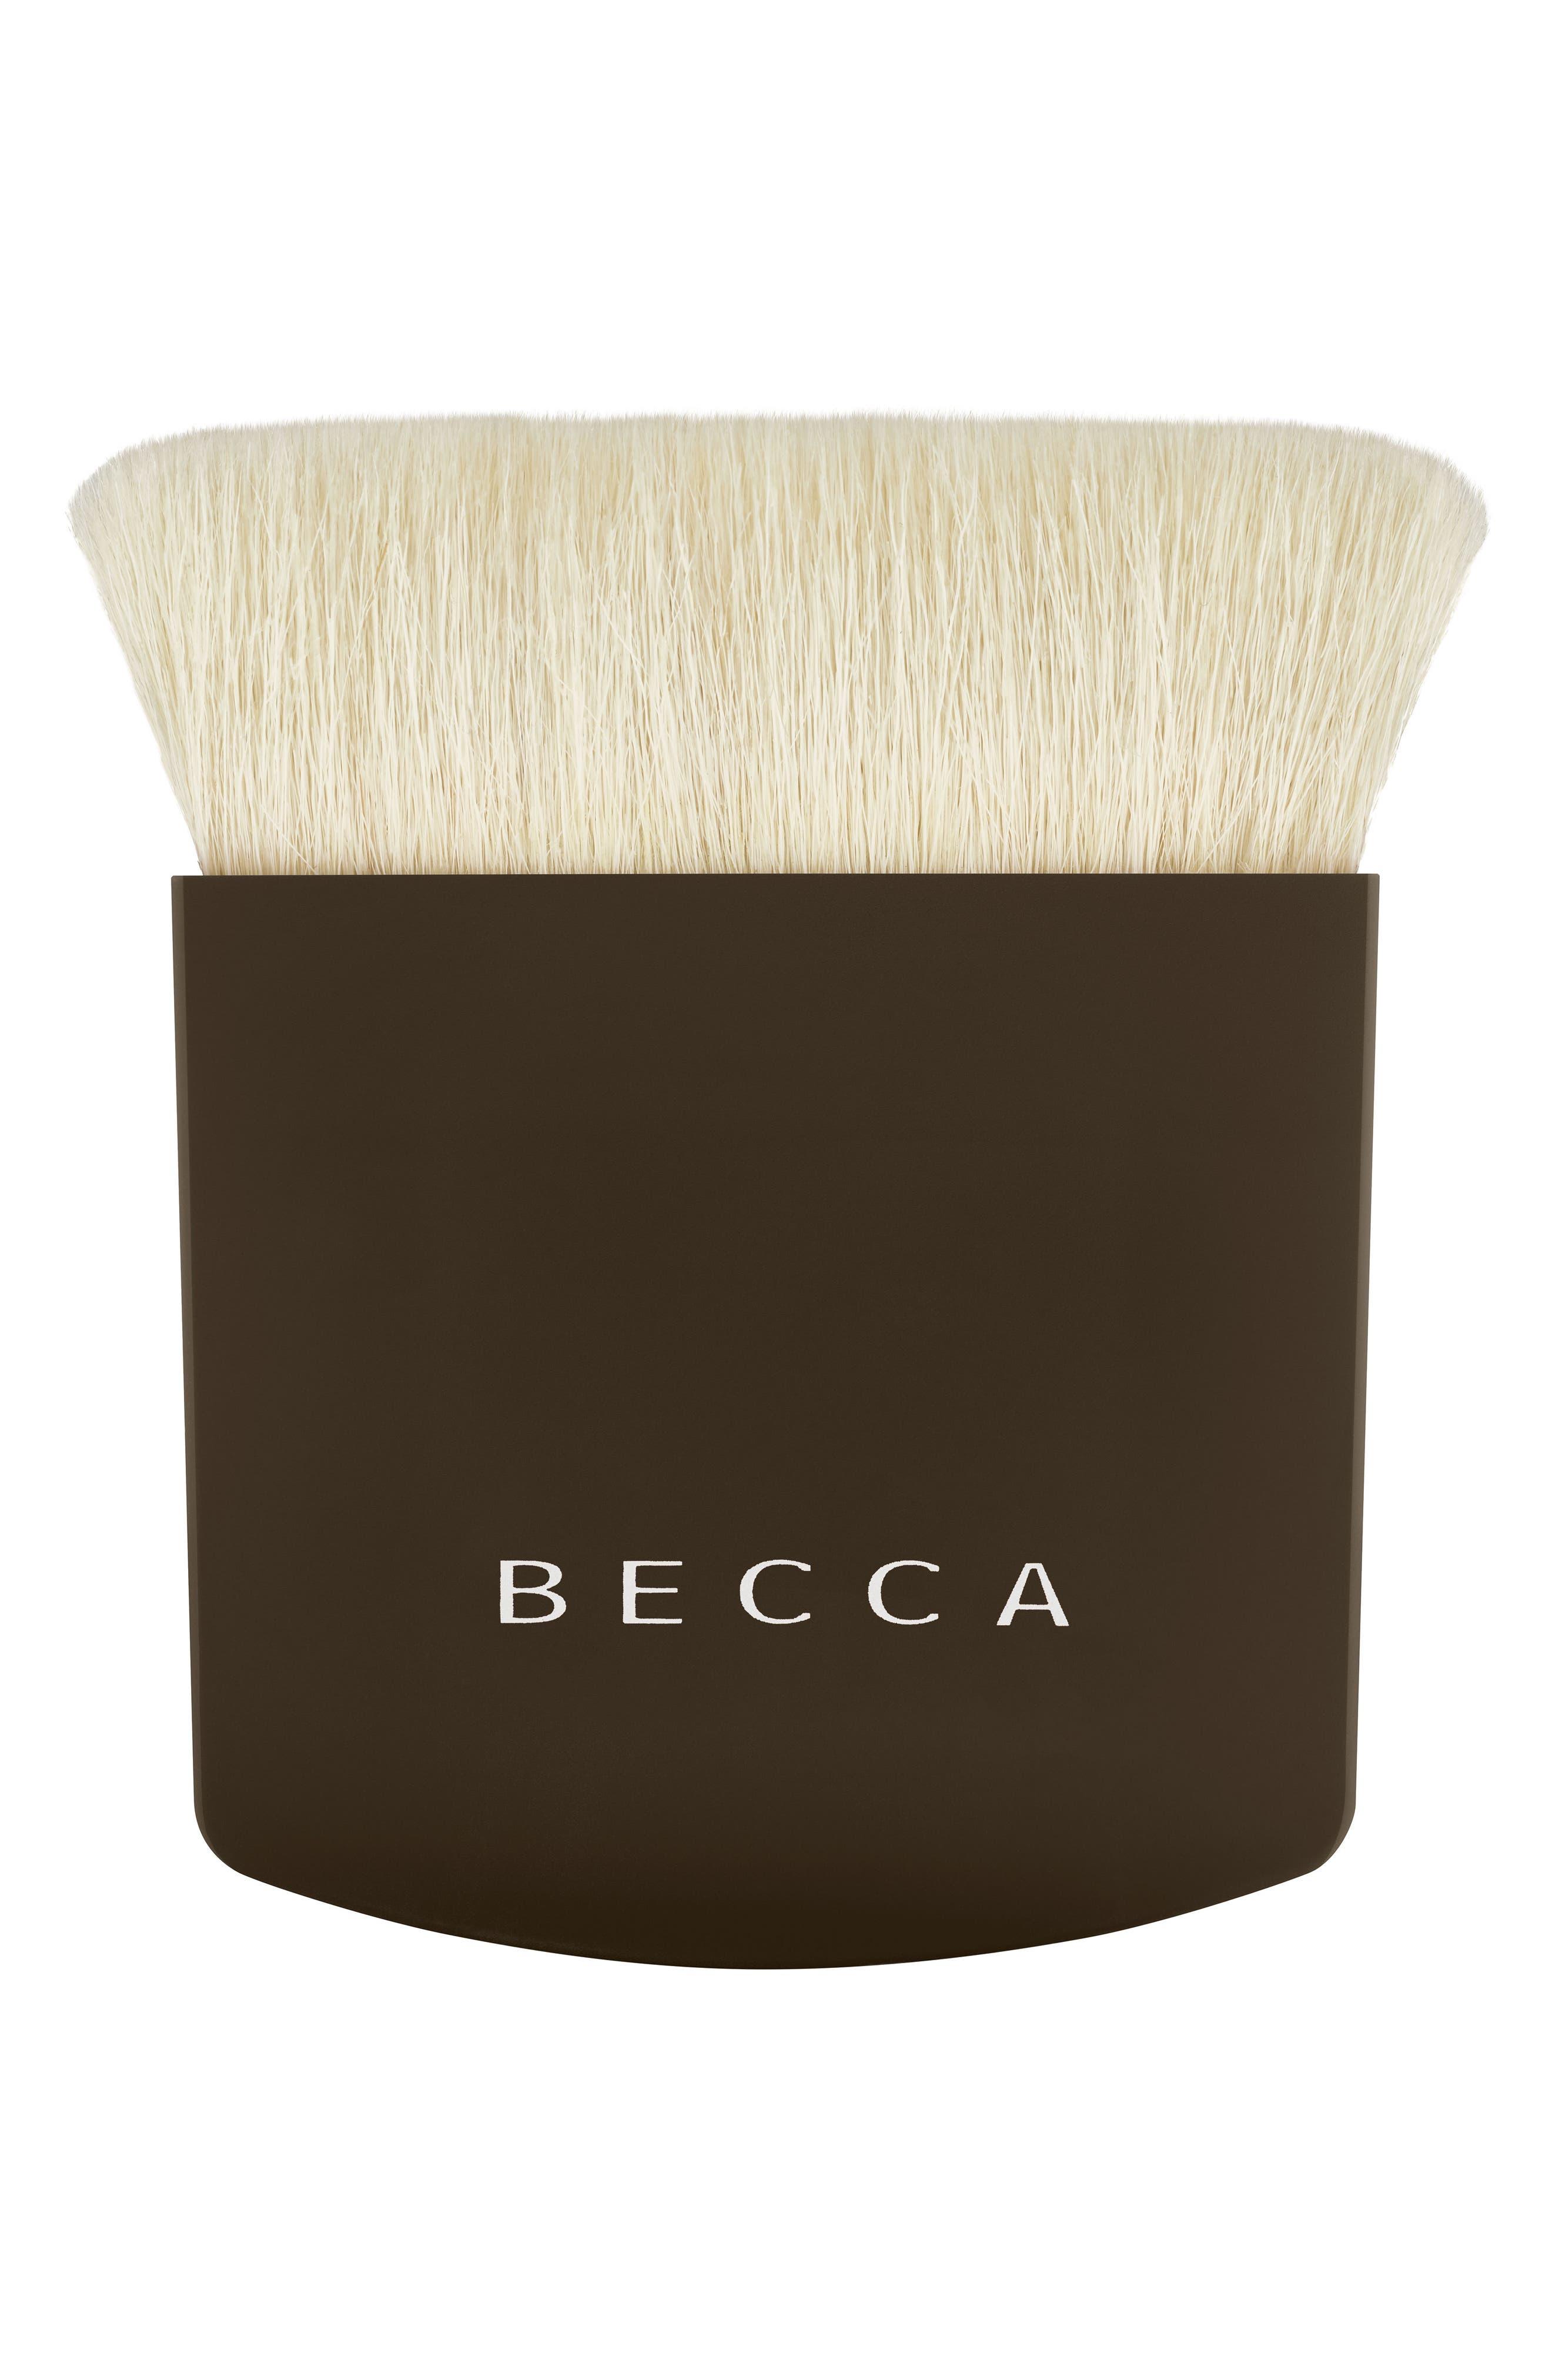 BECCA The One Perfecting Brush